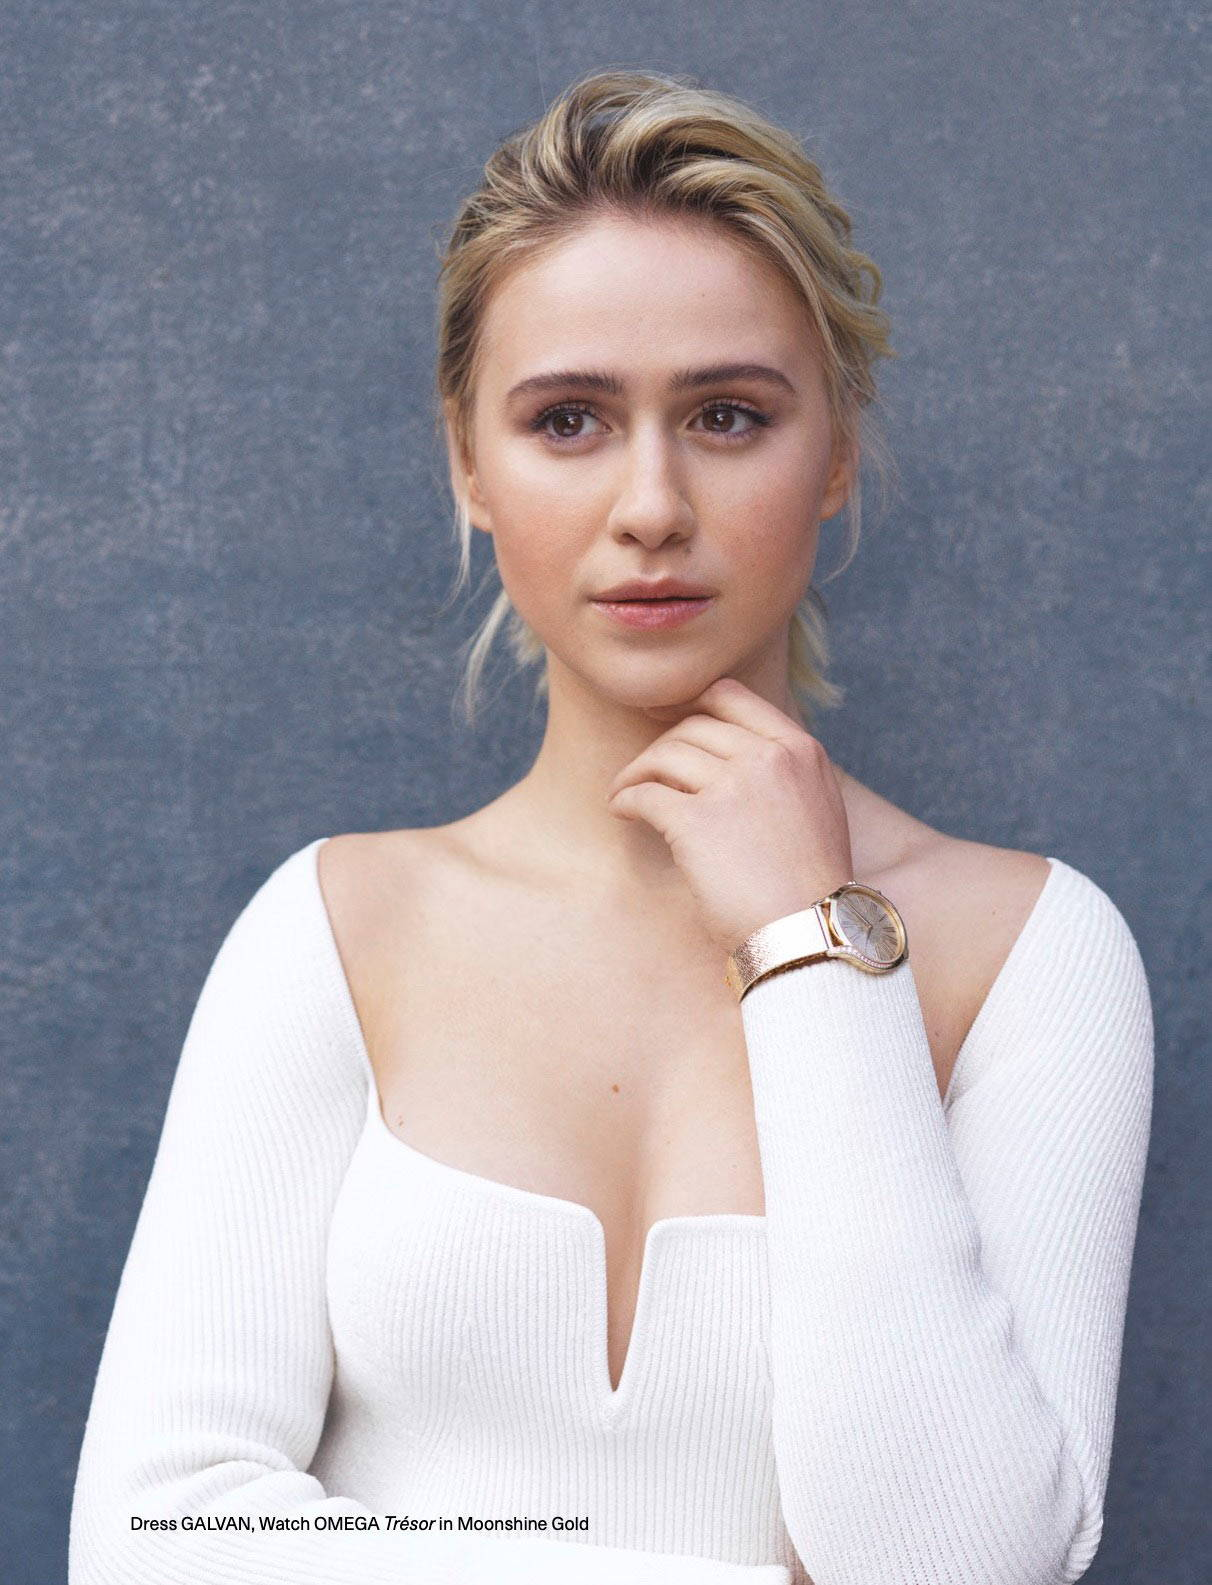 Maria Bakalova wearing Galvan London Body-Hugging Long Sleveed Knit White Dress